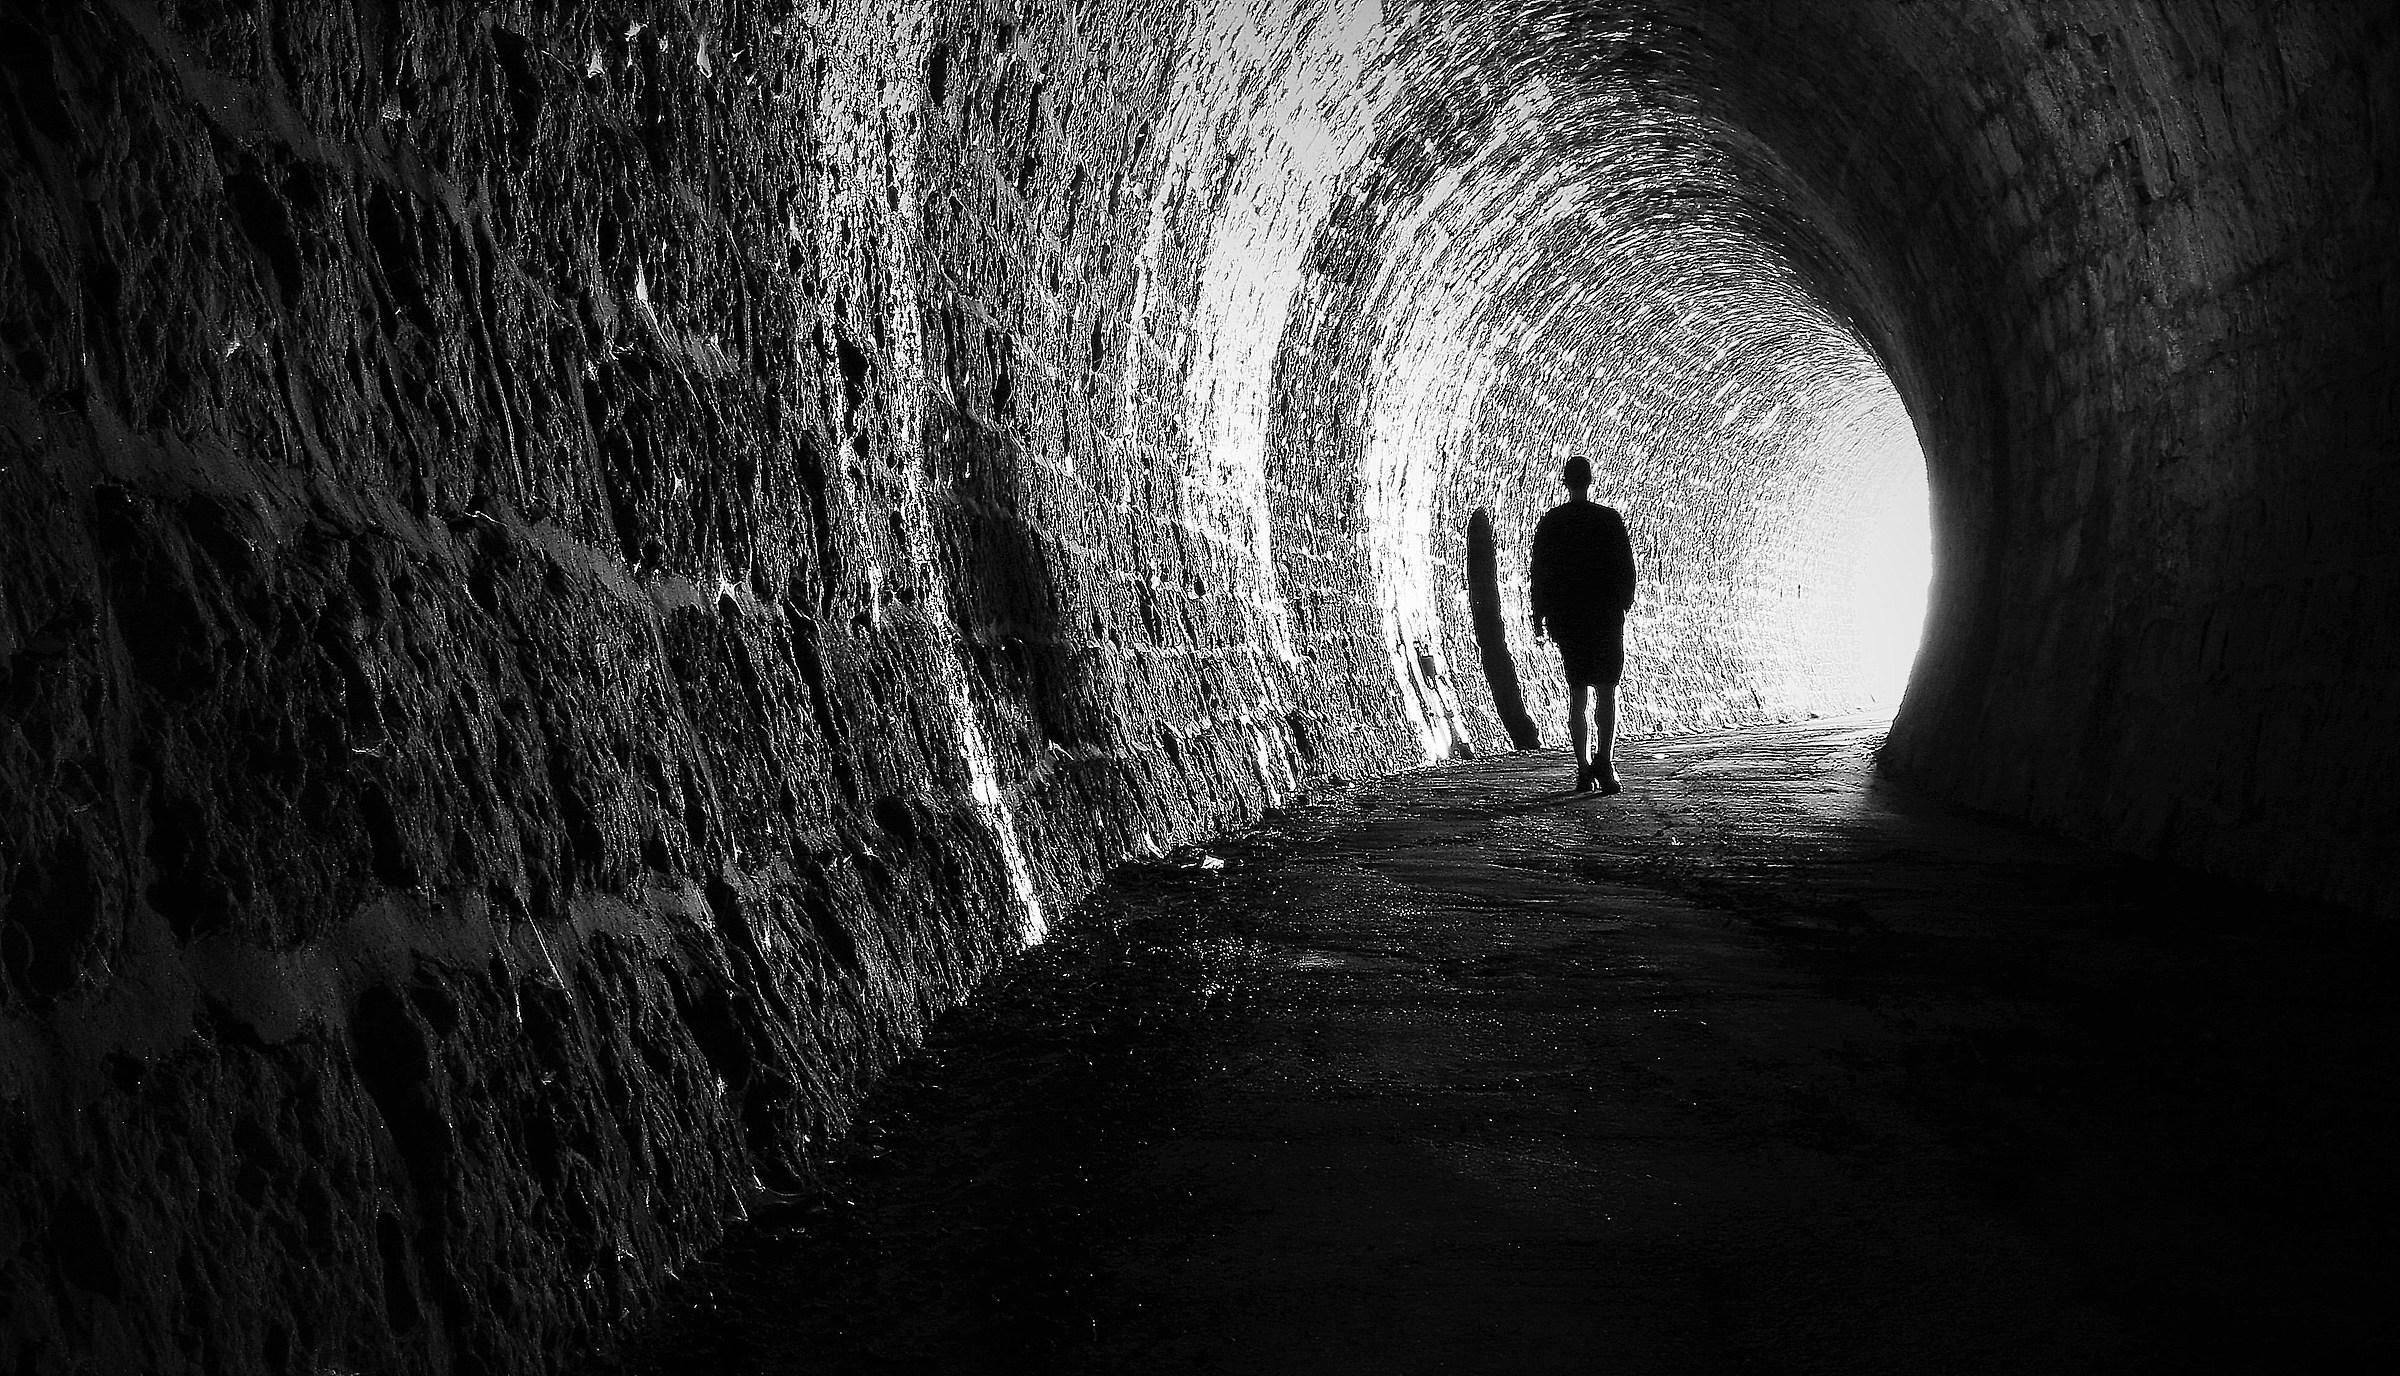 https://epiprev.it/documenti/get_image.php?img=files/2021/blog-made/150-giorni/la-luce-in-fondo-al-tunnel.jpg